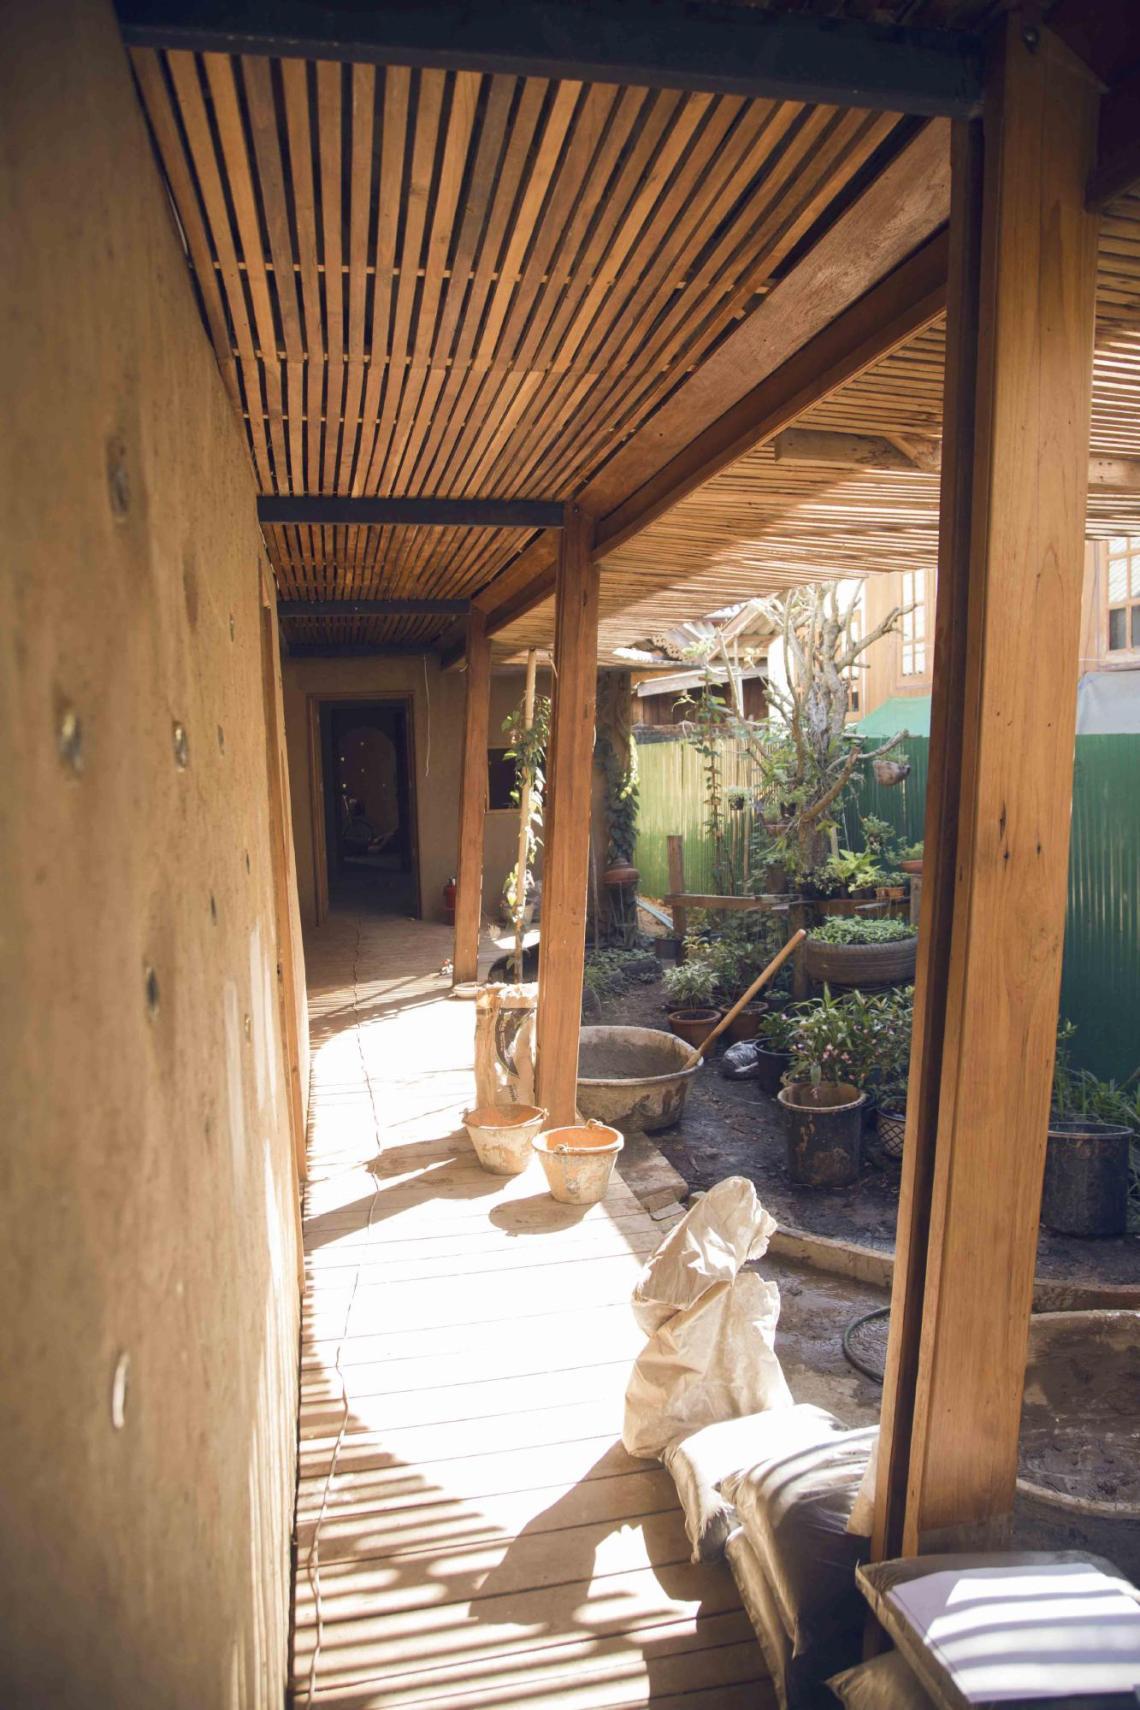 Adobe Greek Home - a-gor-a-architects-adobe-houses_Download Adobe Greek Home - a-gor-a-architects-adobe-houses  Gallery_13062.jpg